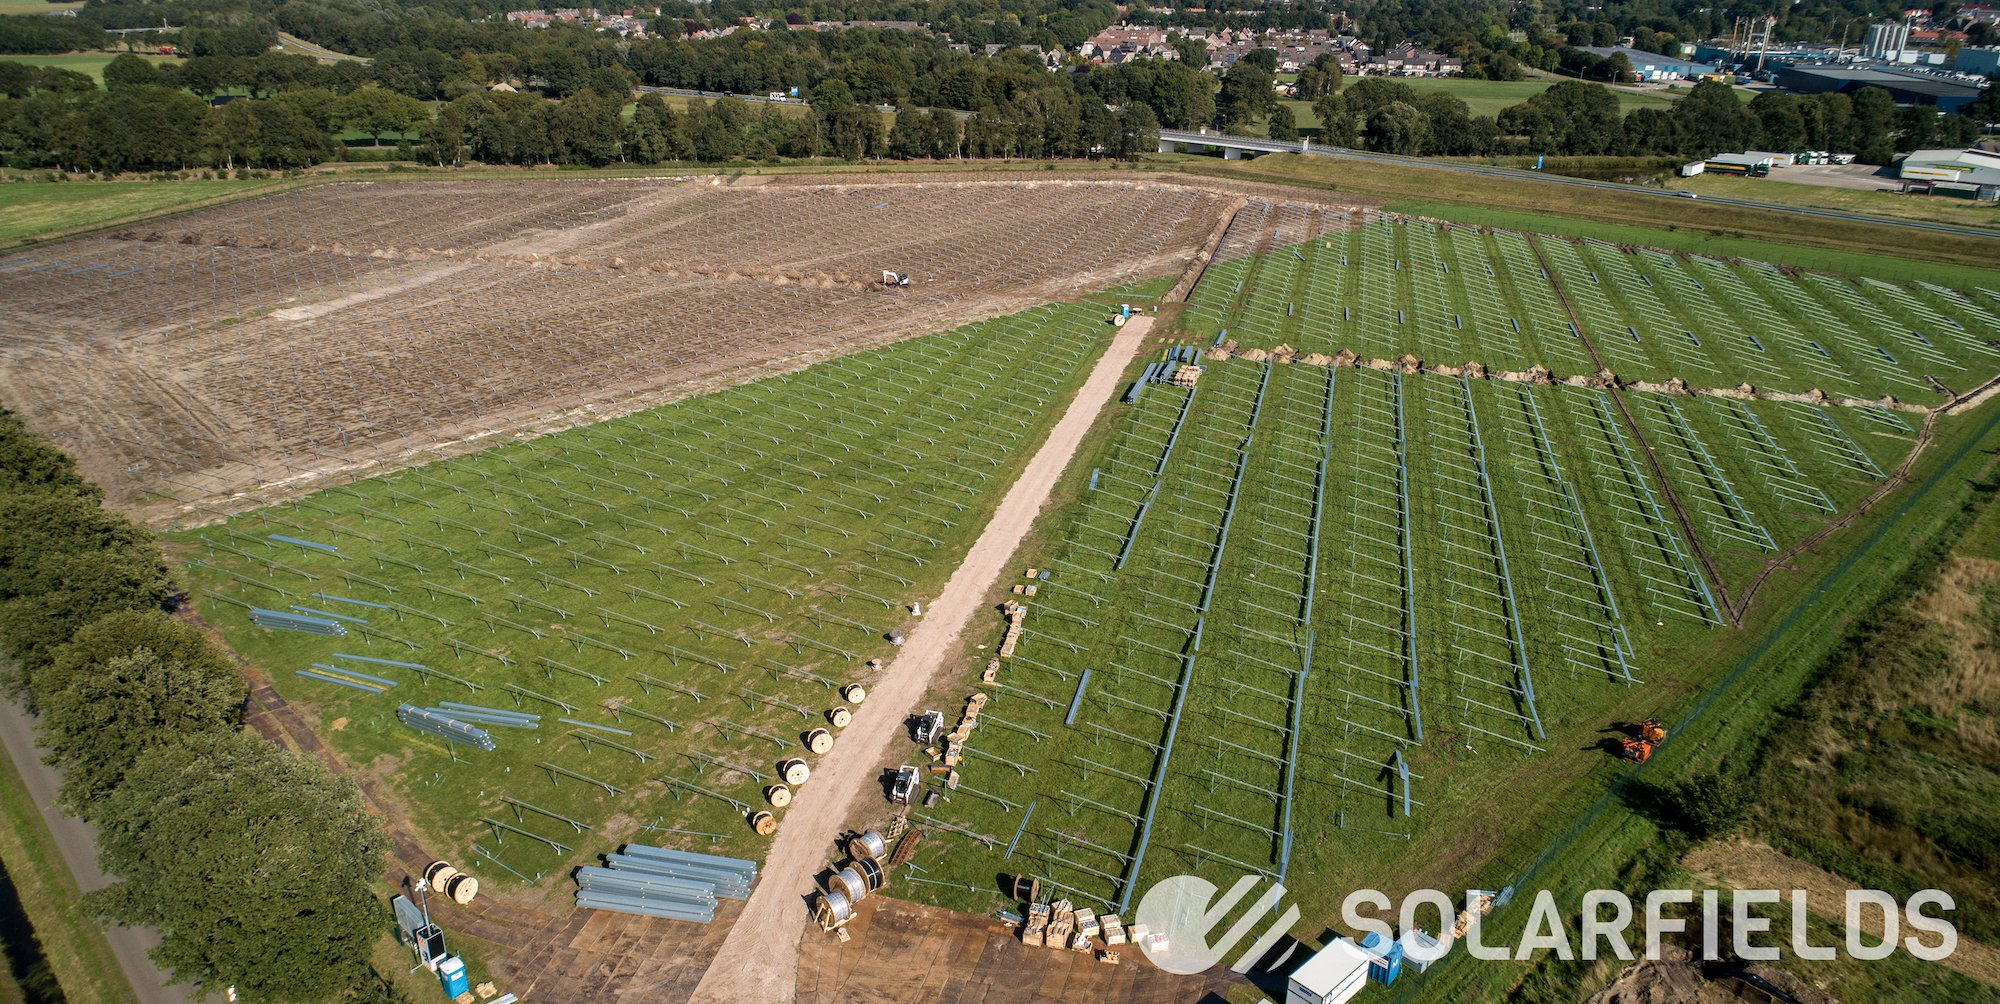 Solarfields_Coevorden_Fase_I (4 of 10) kopie.jpg